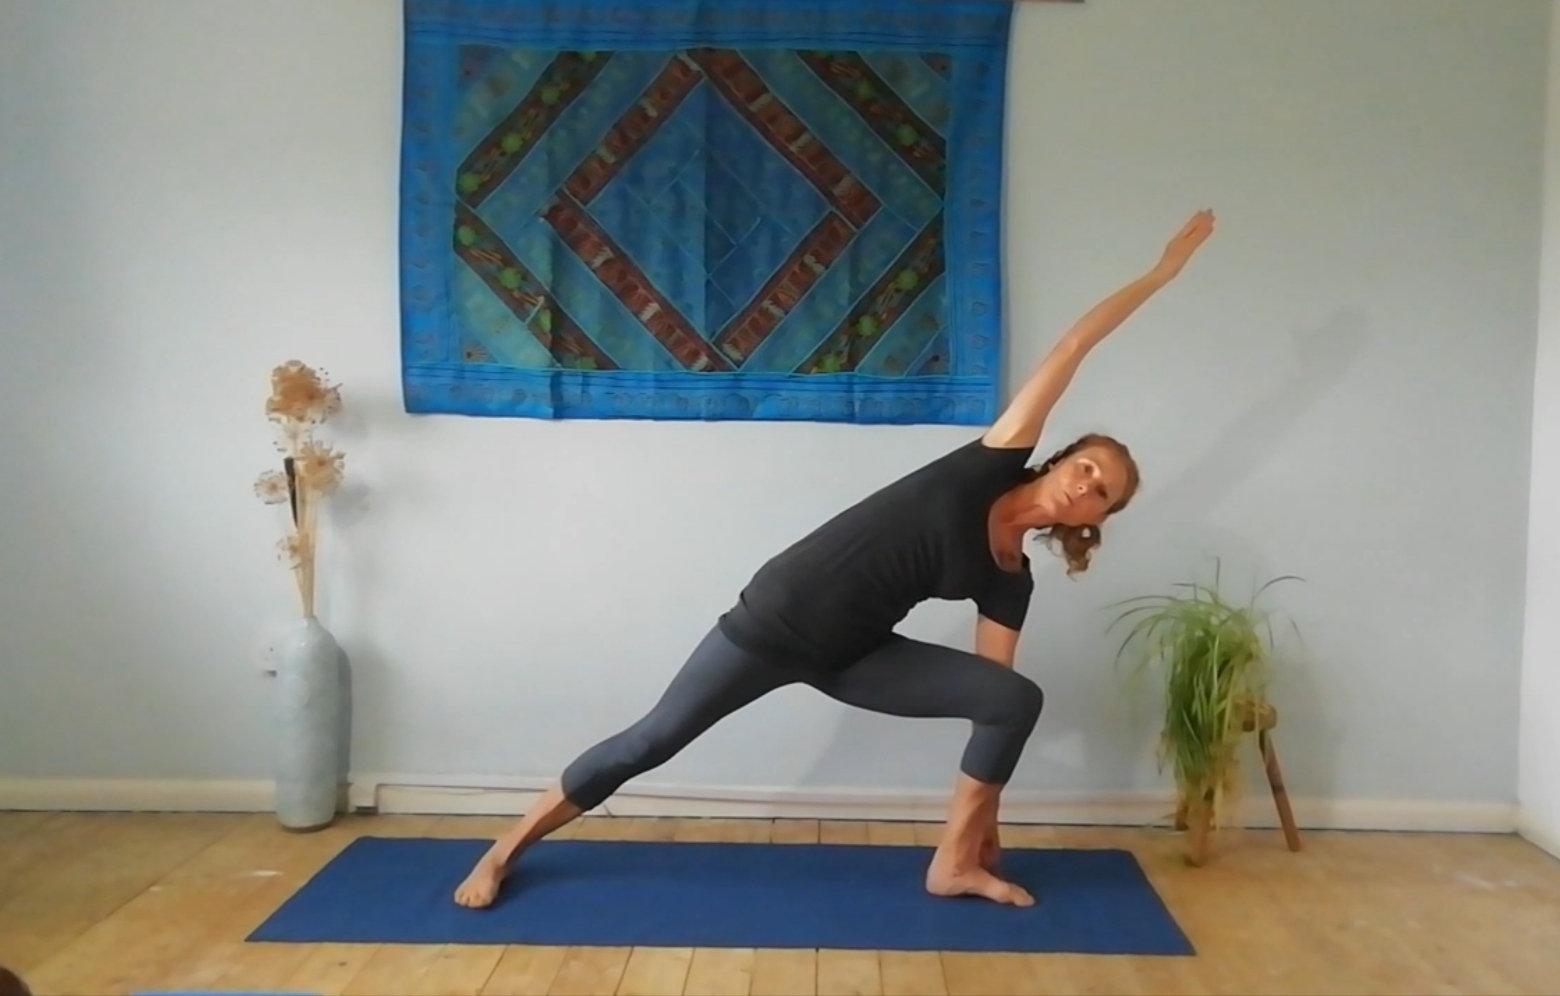 Friday 8-8.50am Early bird yoga